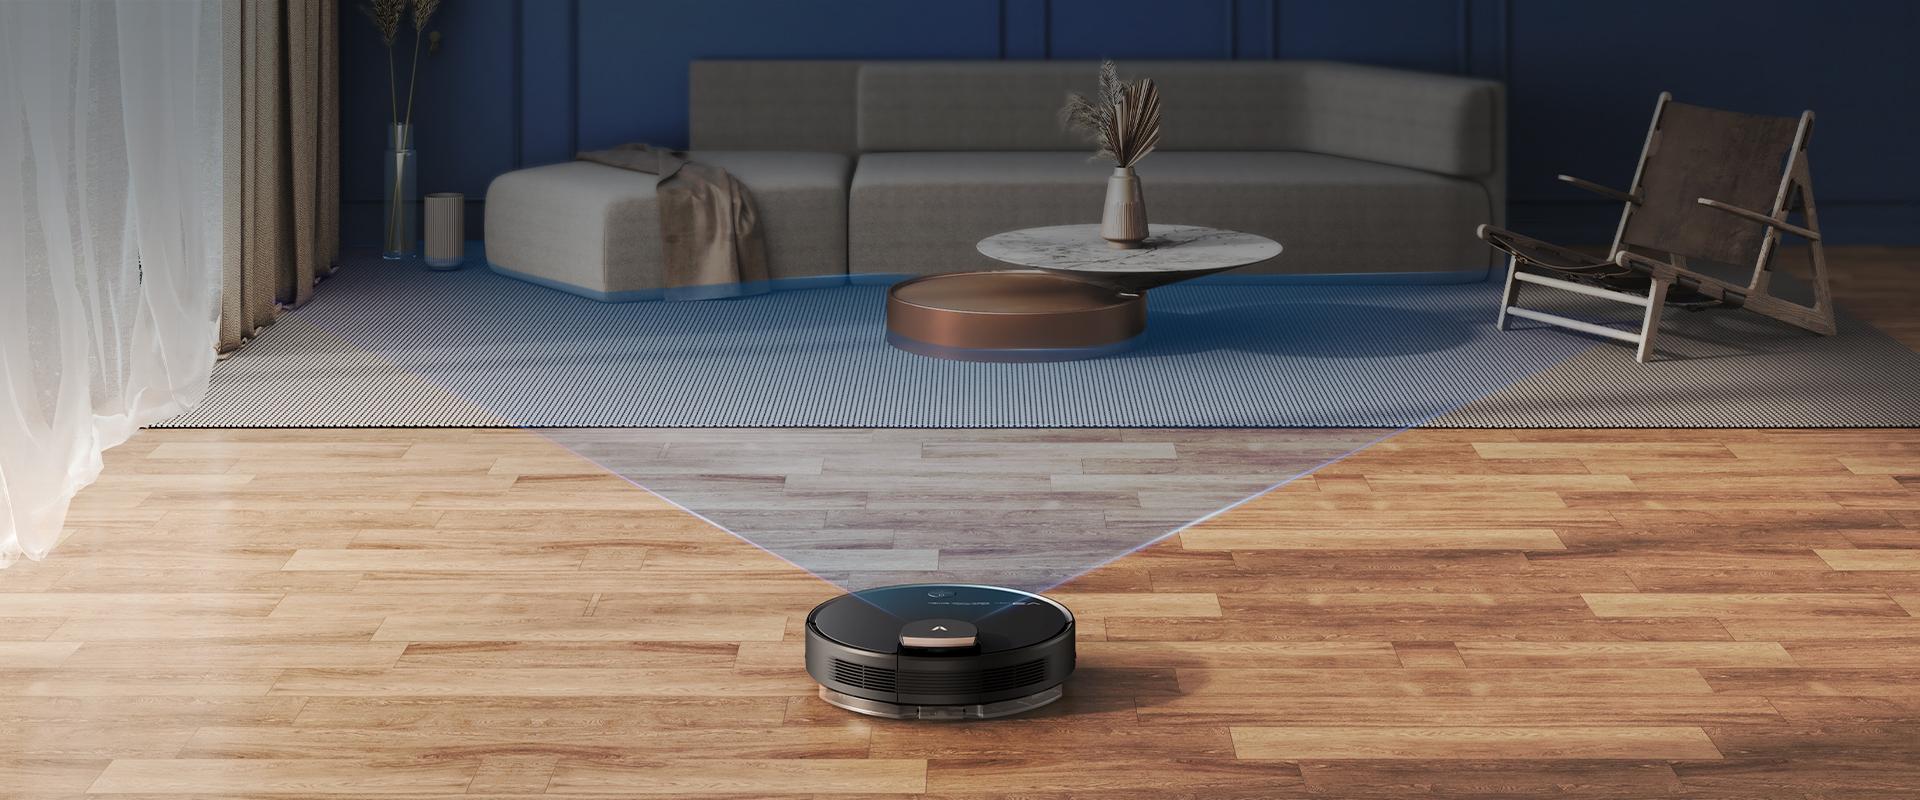 360° LDS Laser robot vacuum and mop